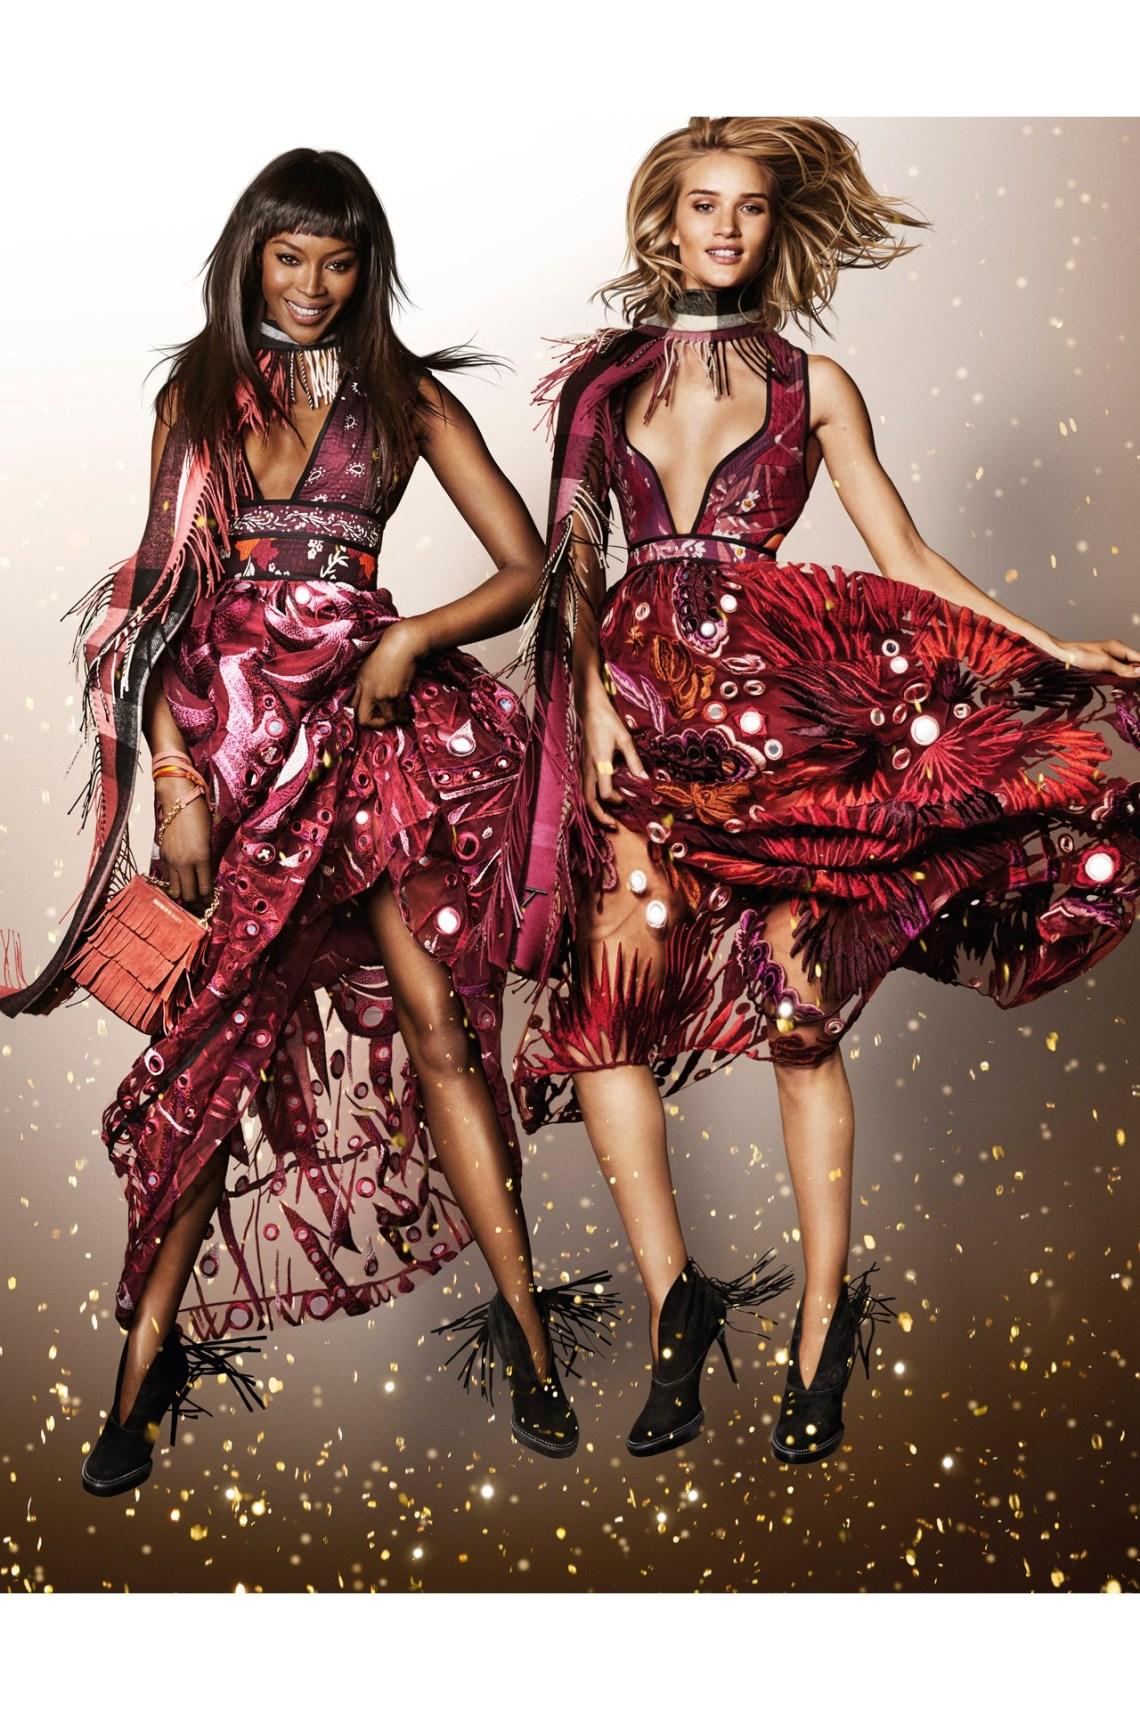 Naomie-Campbell-Rosie-Huntington-Whiteley-Burberry-Campaign-Vogue-30Oct15-Mario-Testino_b